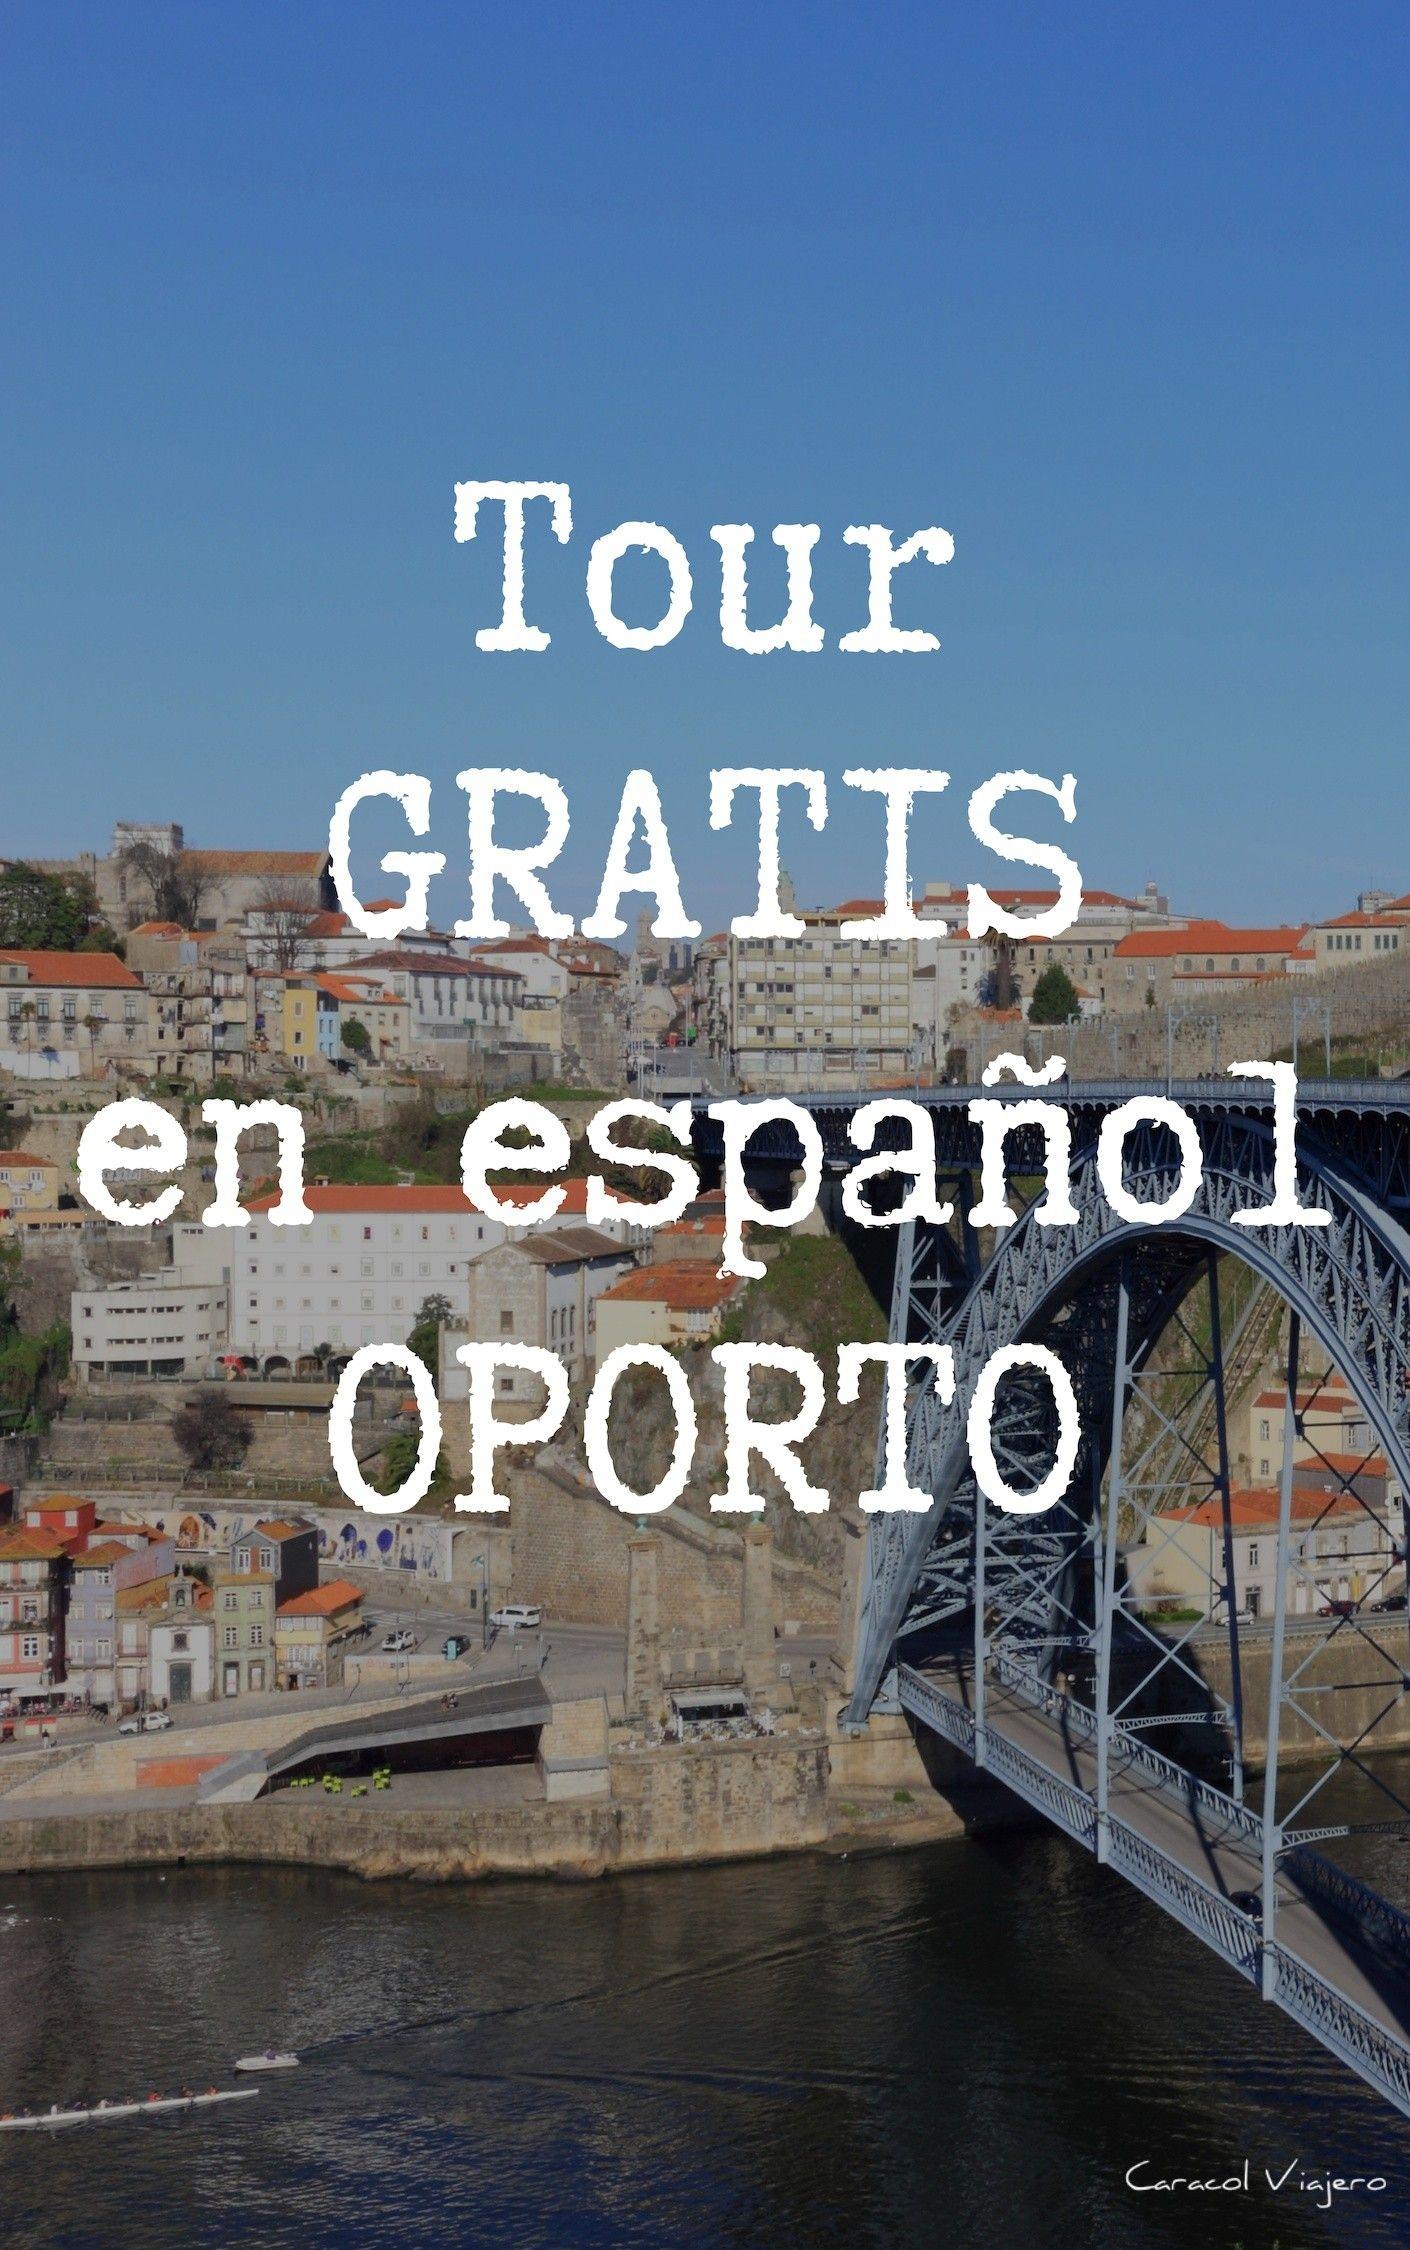 Tour Gratis En Espanol Oporto Descubre Toda La Historia De La